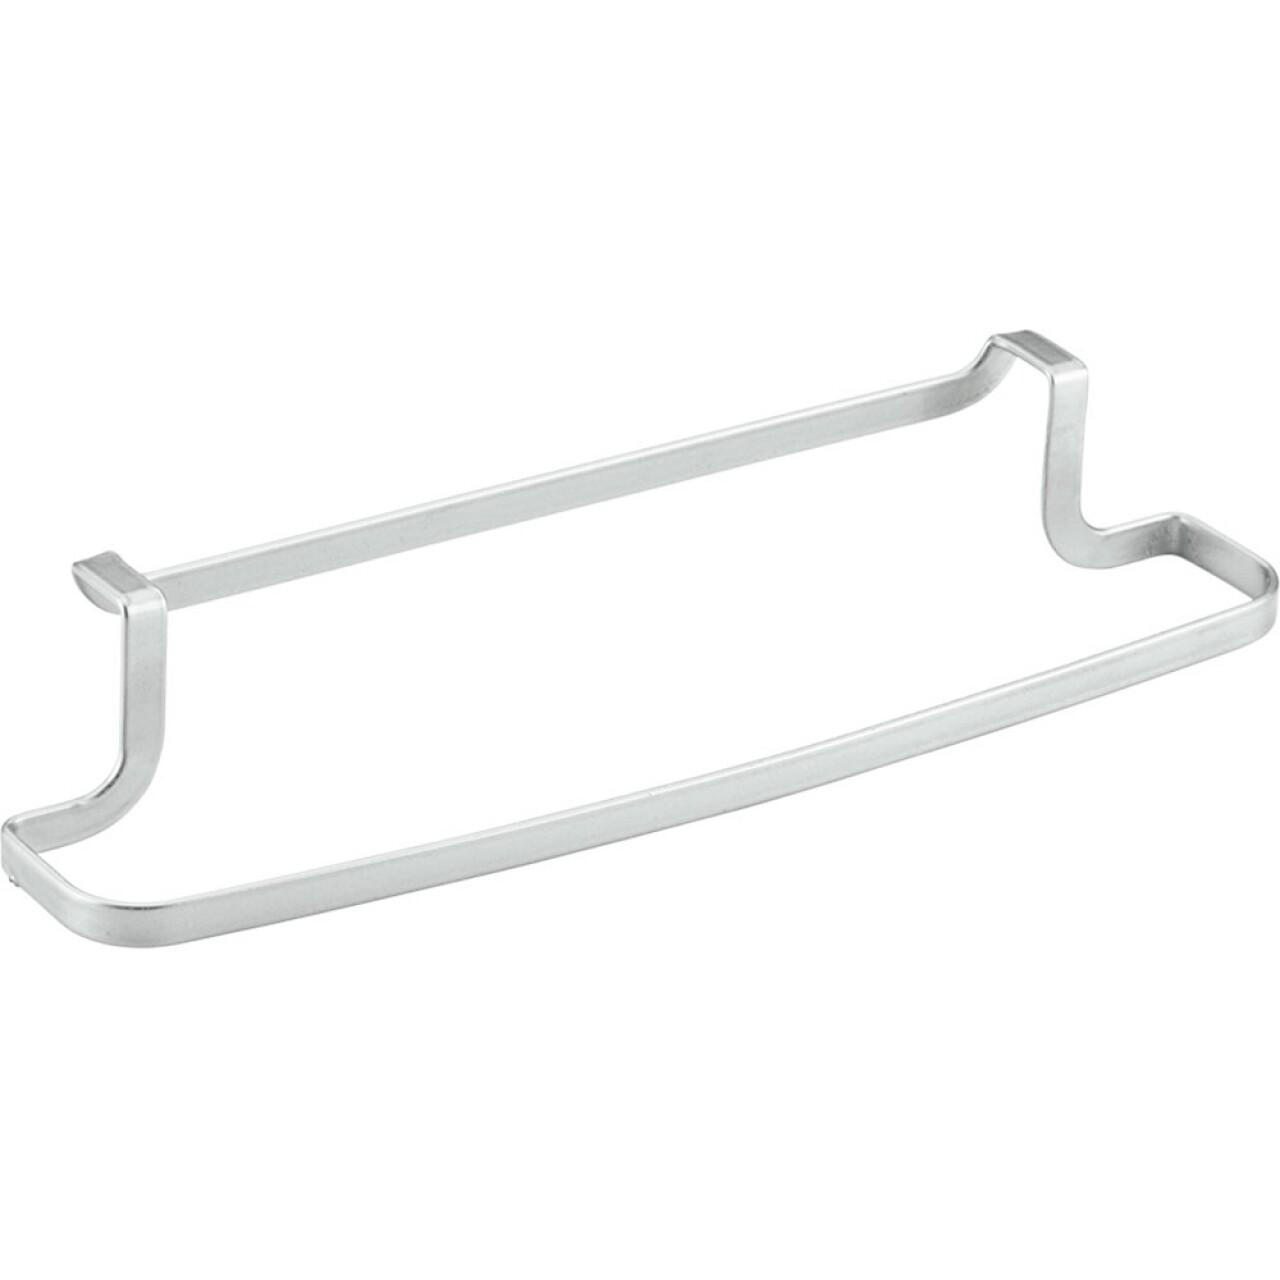 Suport prosoape pentru dulap Galileo, Metaltex, 30x8x5 cm, metal/invelis Polytherm, argintiu